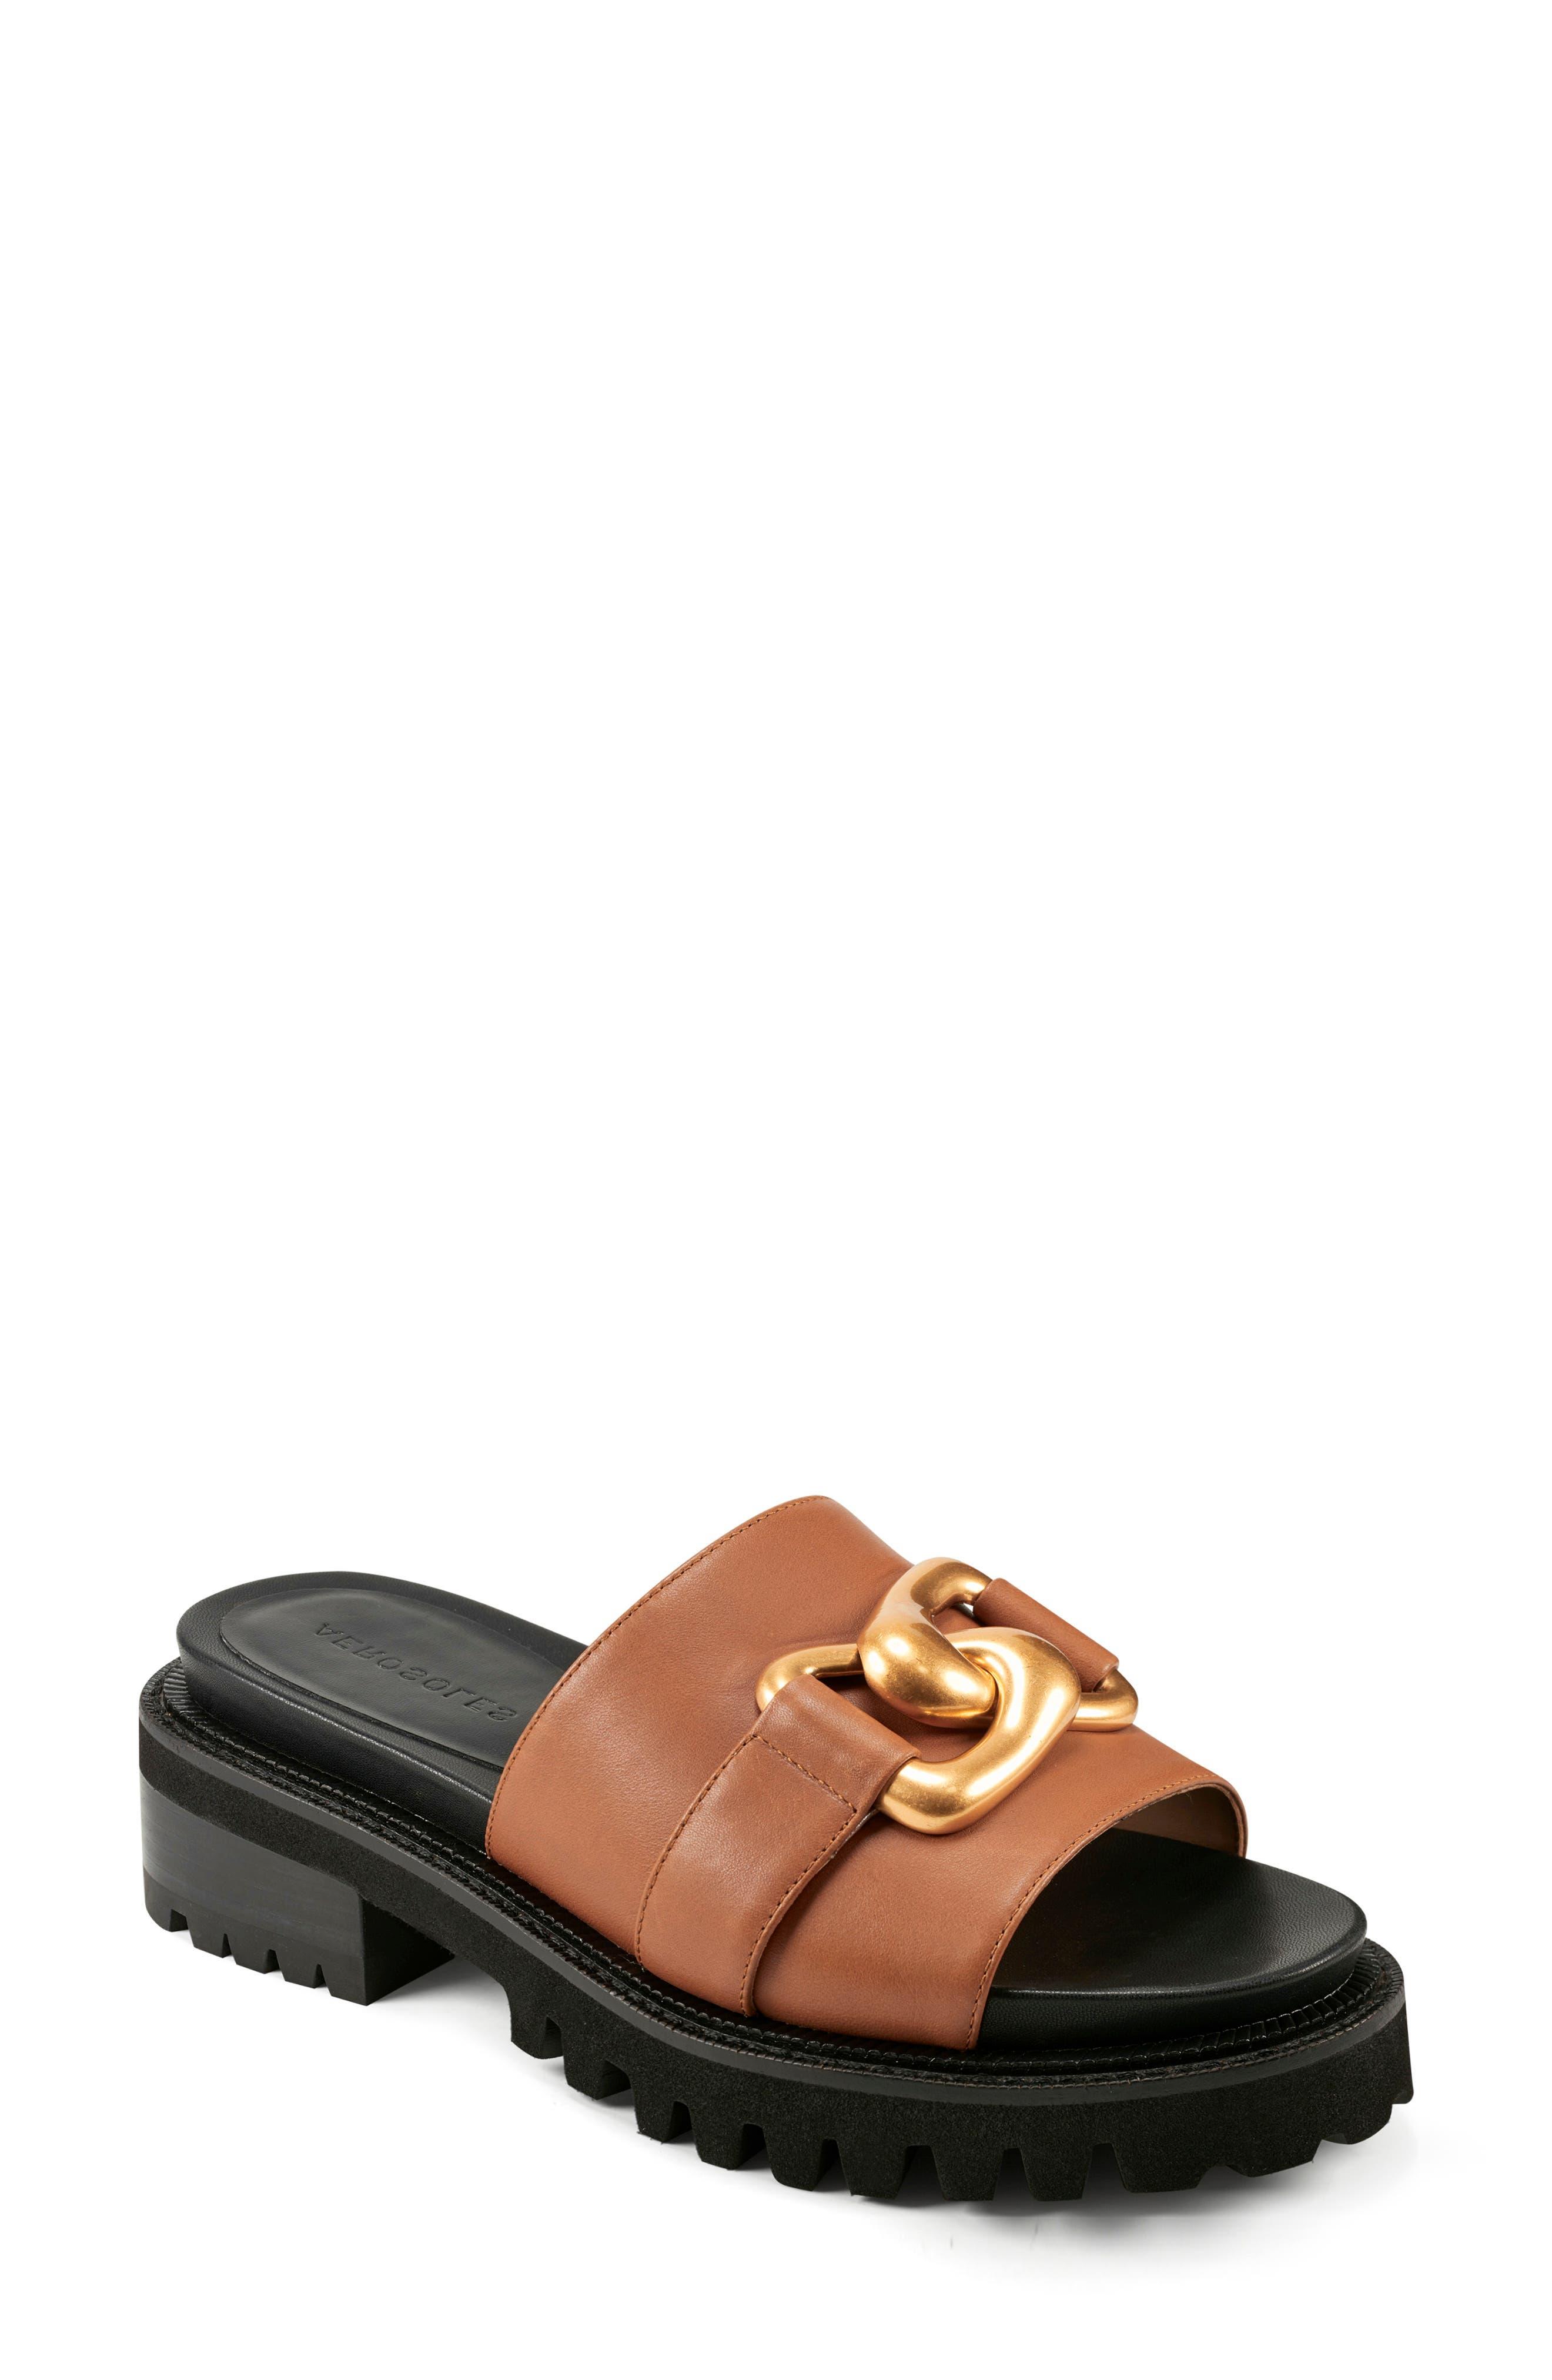 Lima Slide Sandal